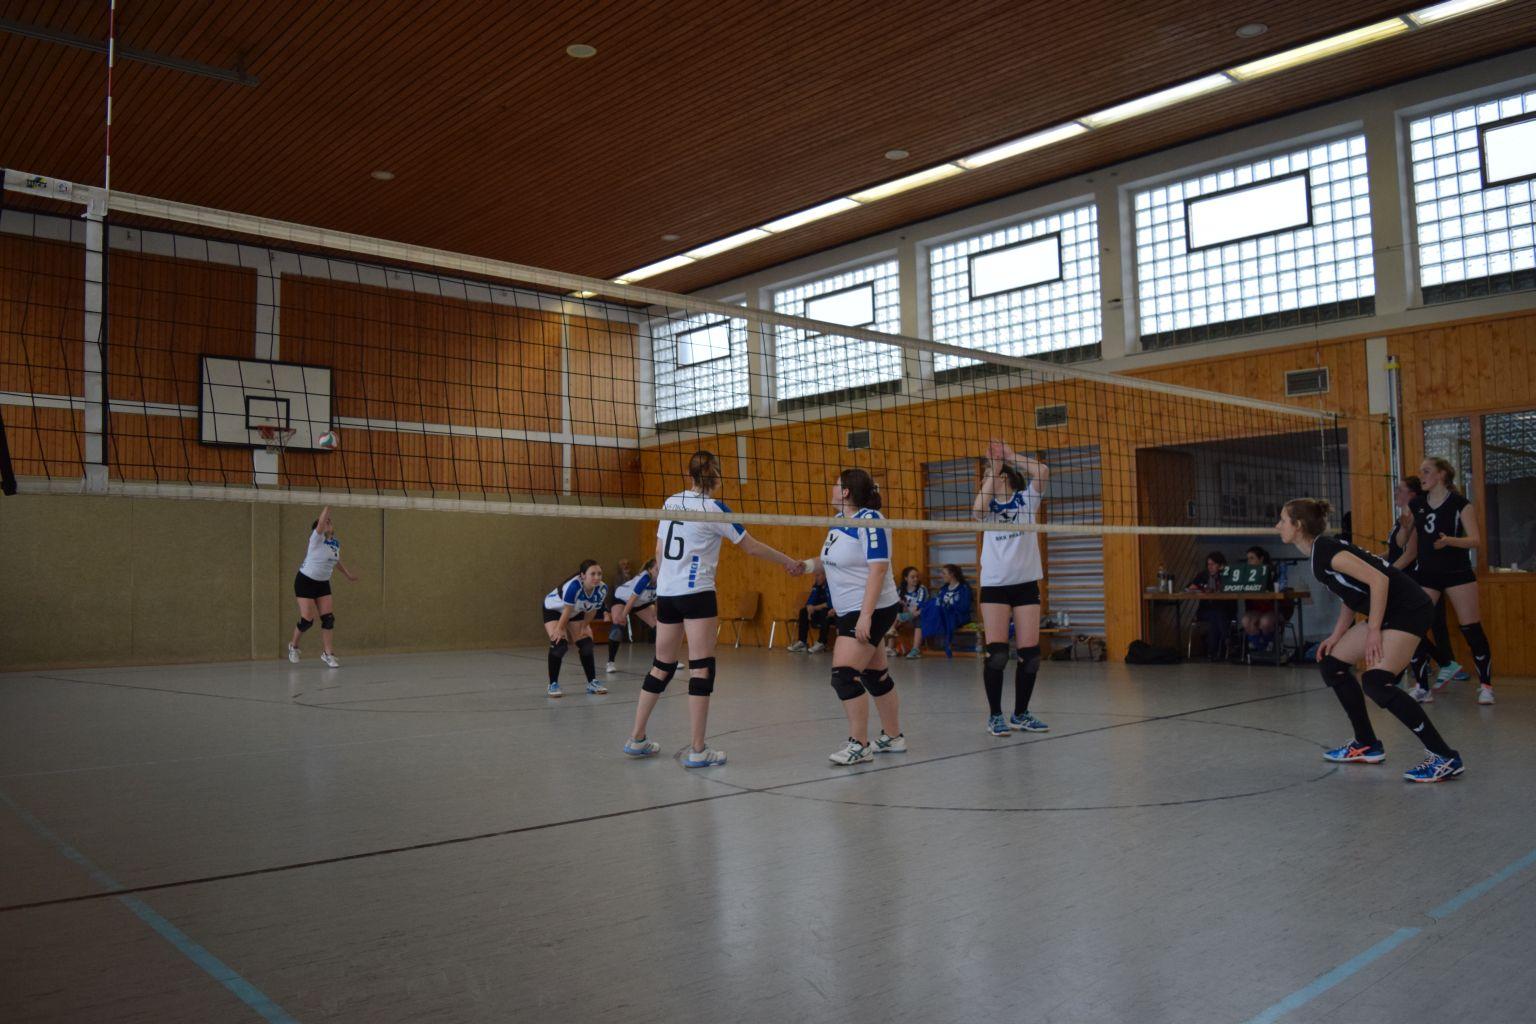 170311_Volleyball_DSC_0339